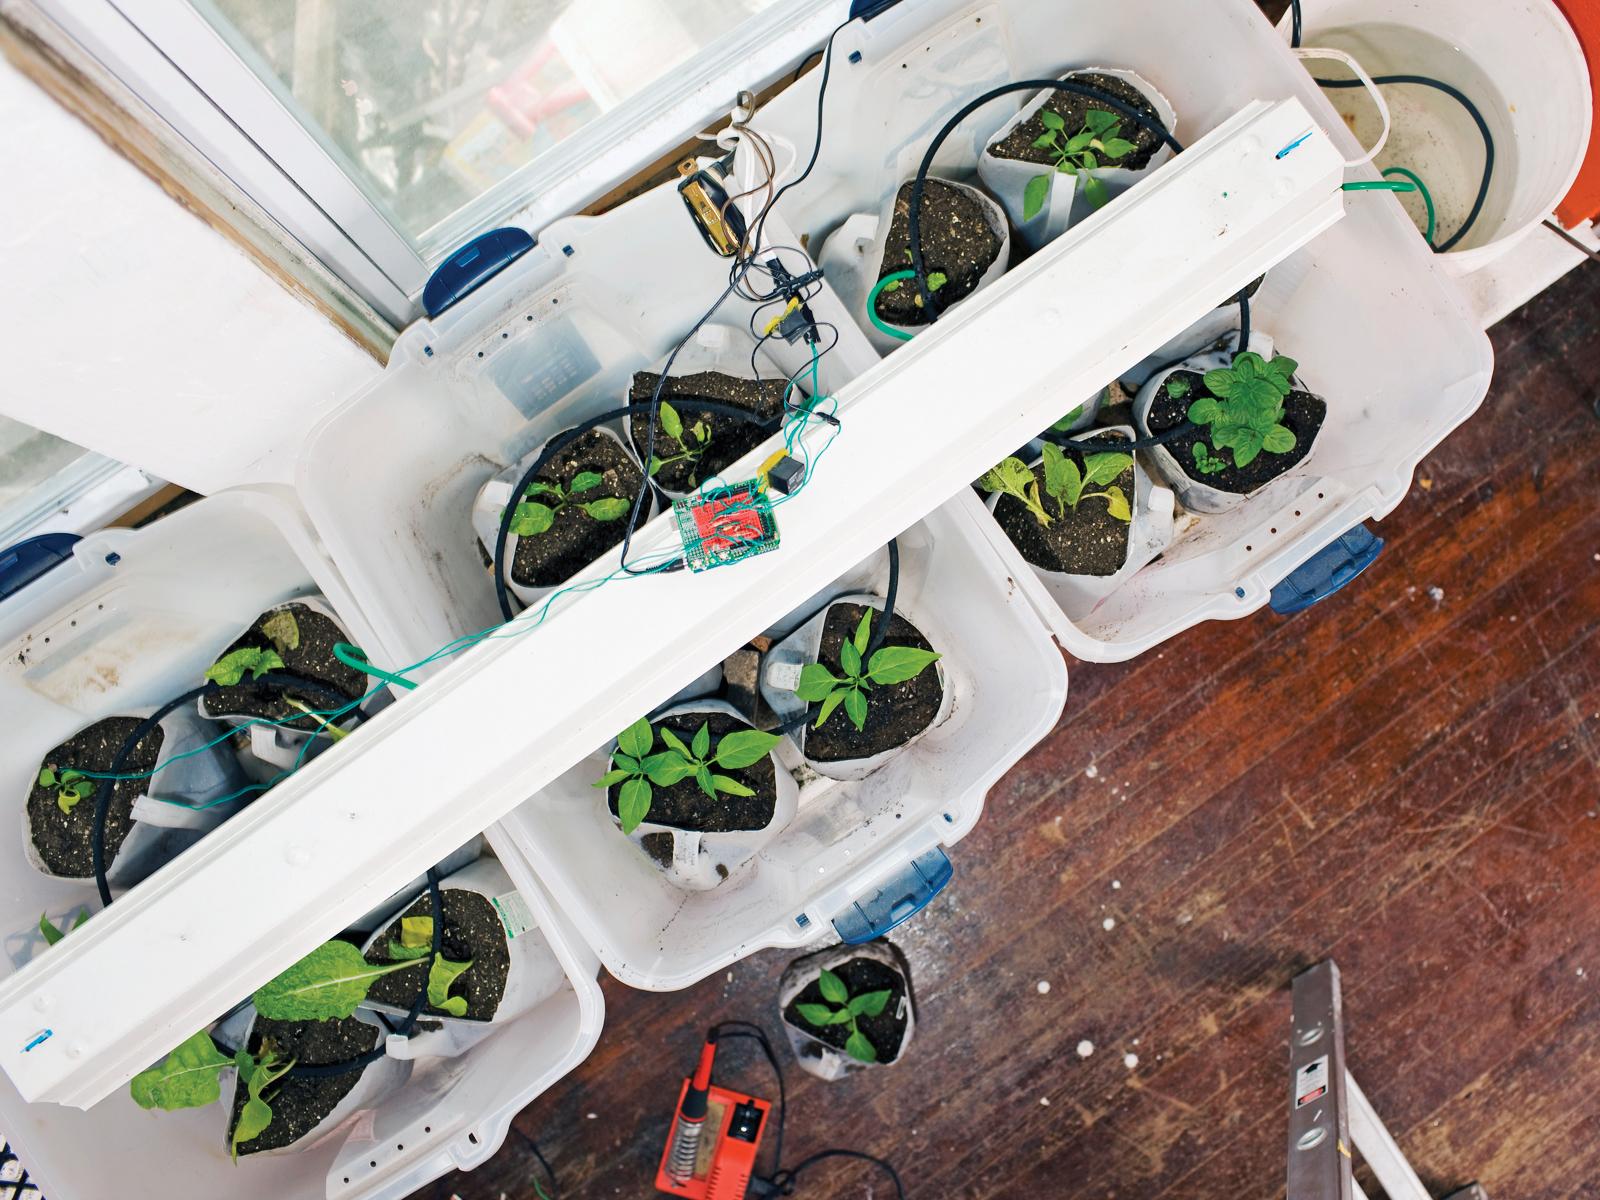 Garduino Geek Gardening